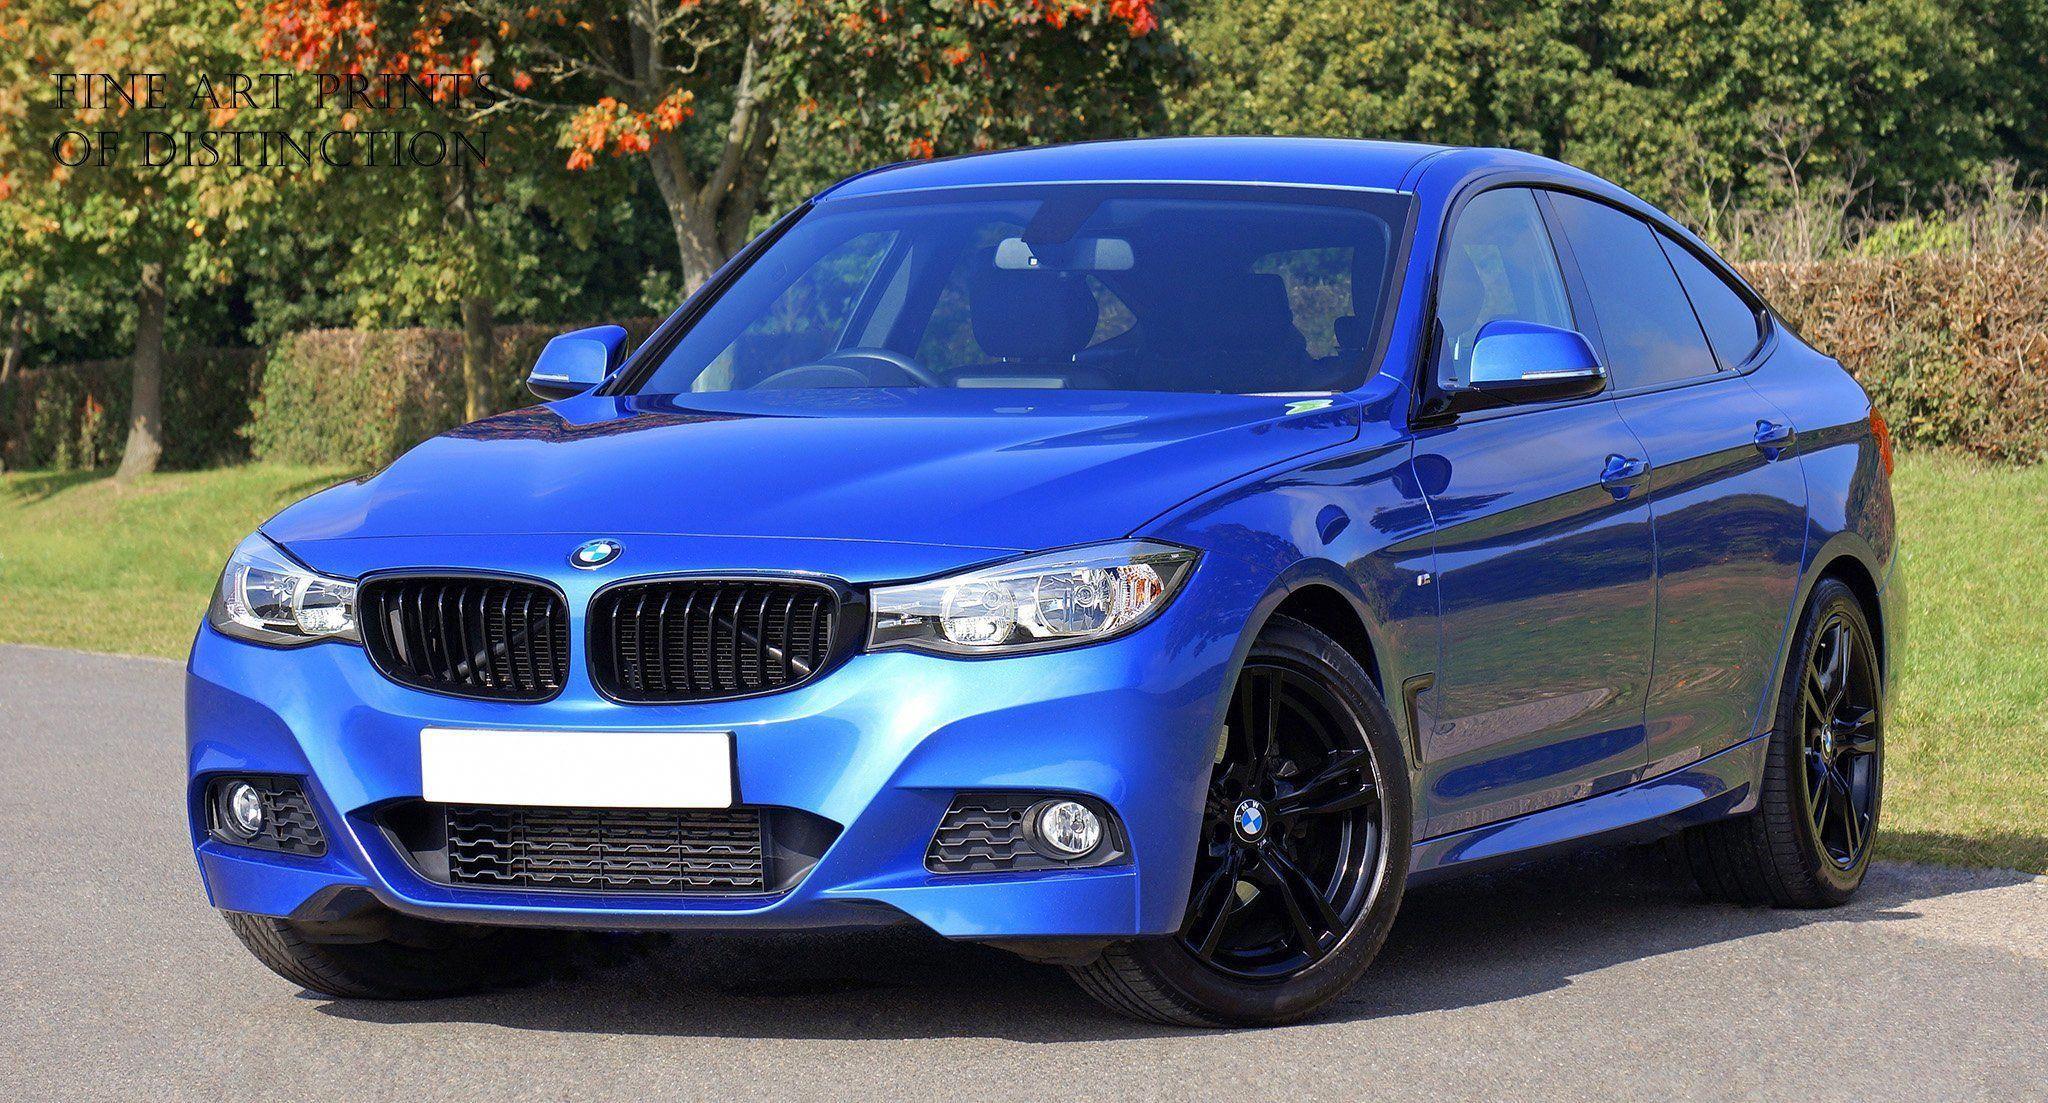 BMW Blue Sedan Car Art Print | Cheap car rental, Bmw blue